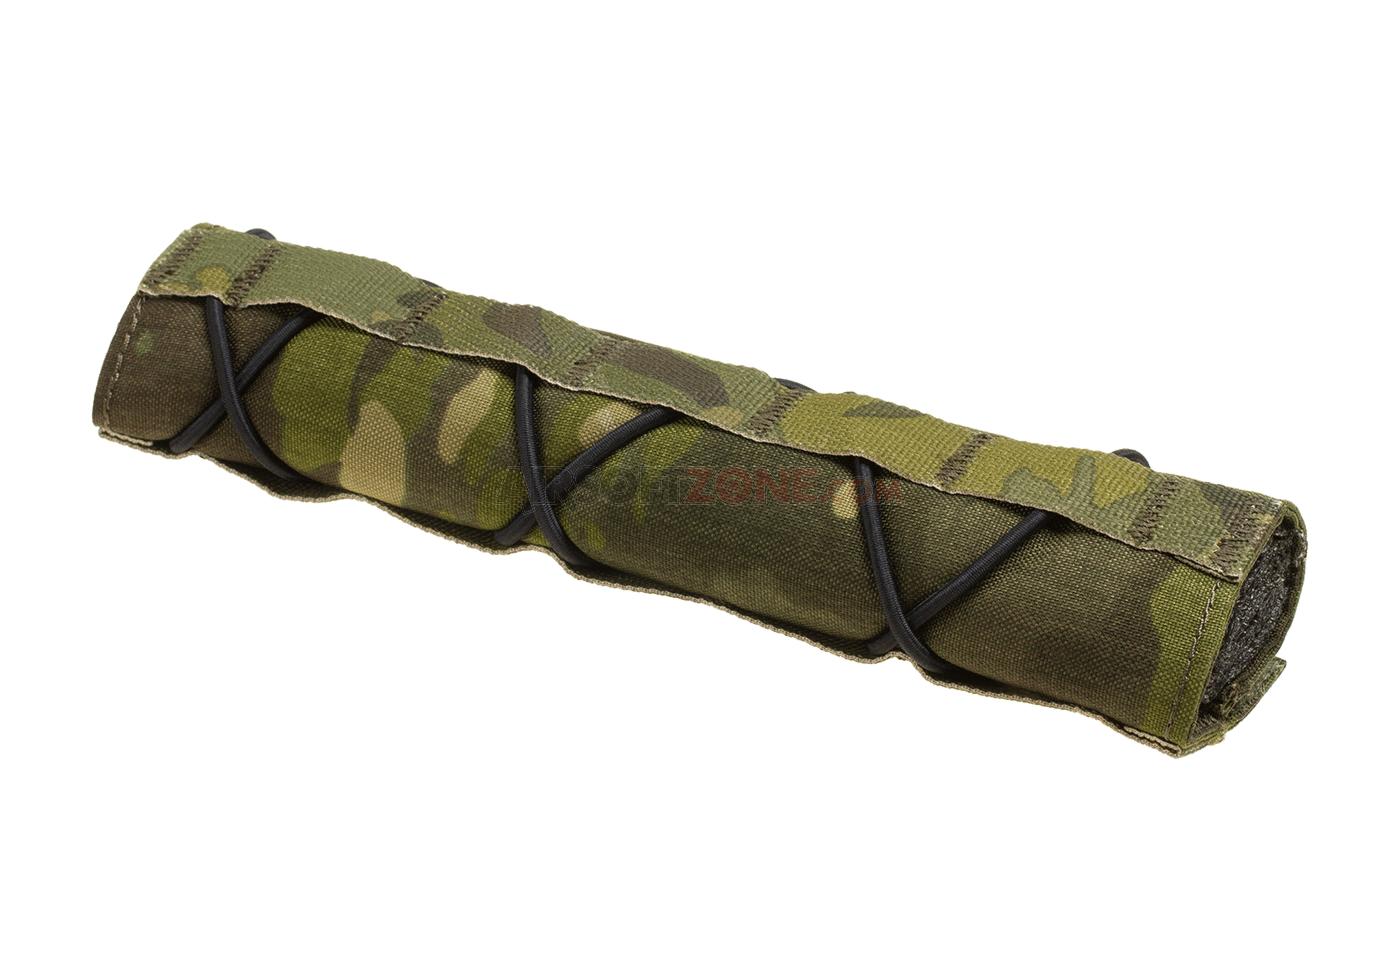 Husa Pt. Amortizor - 22cm - Multicam Tropic imagine